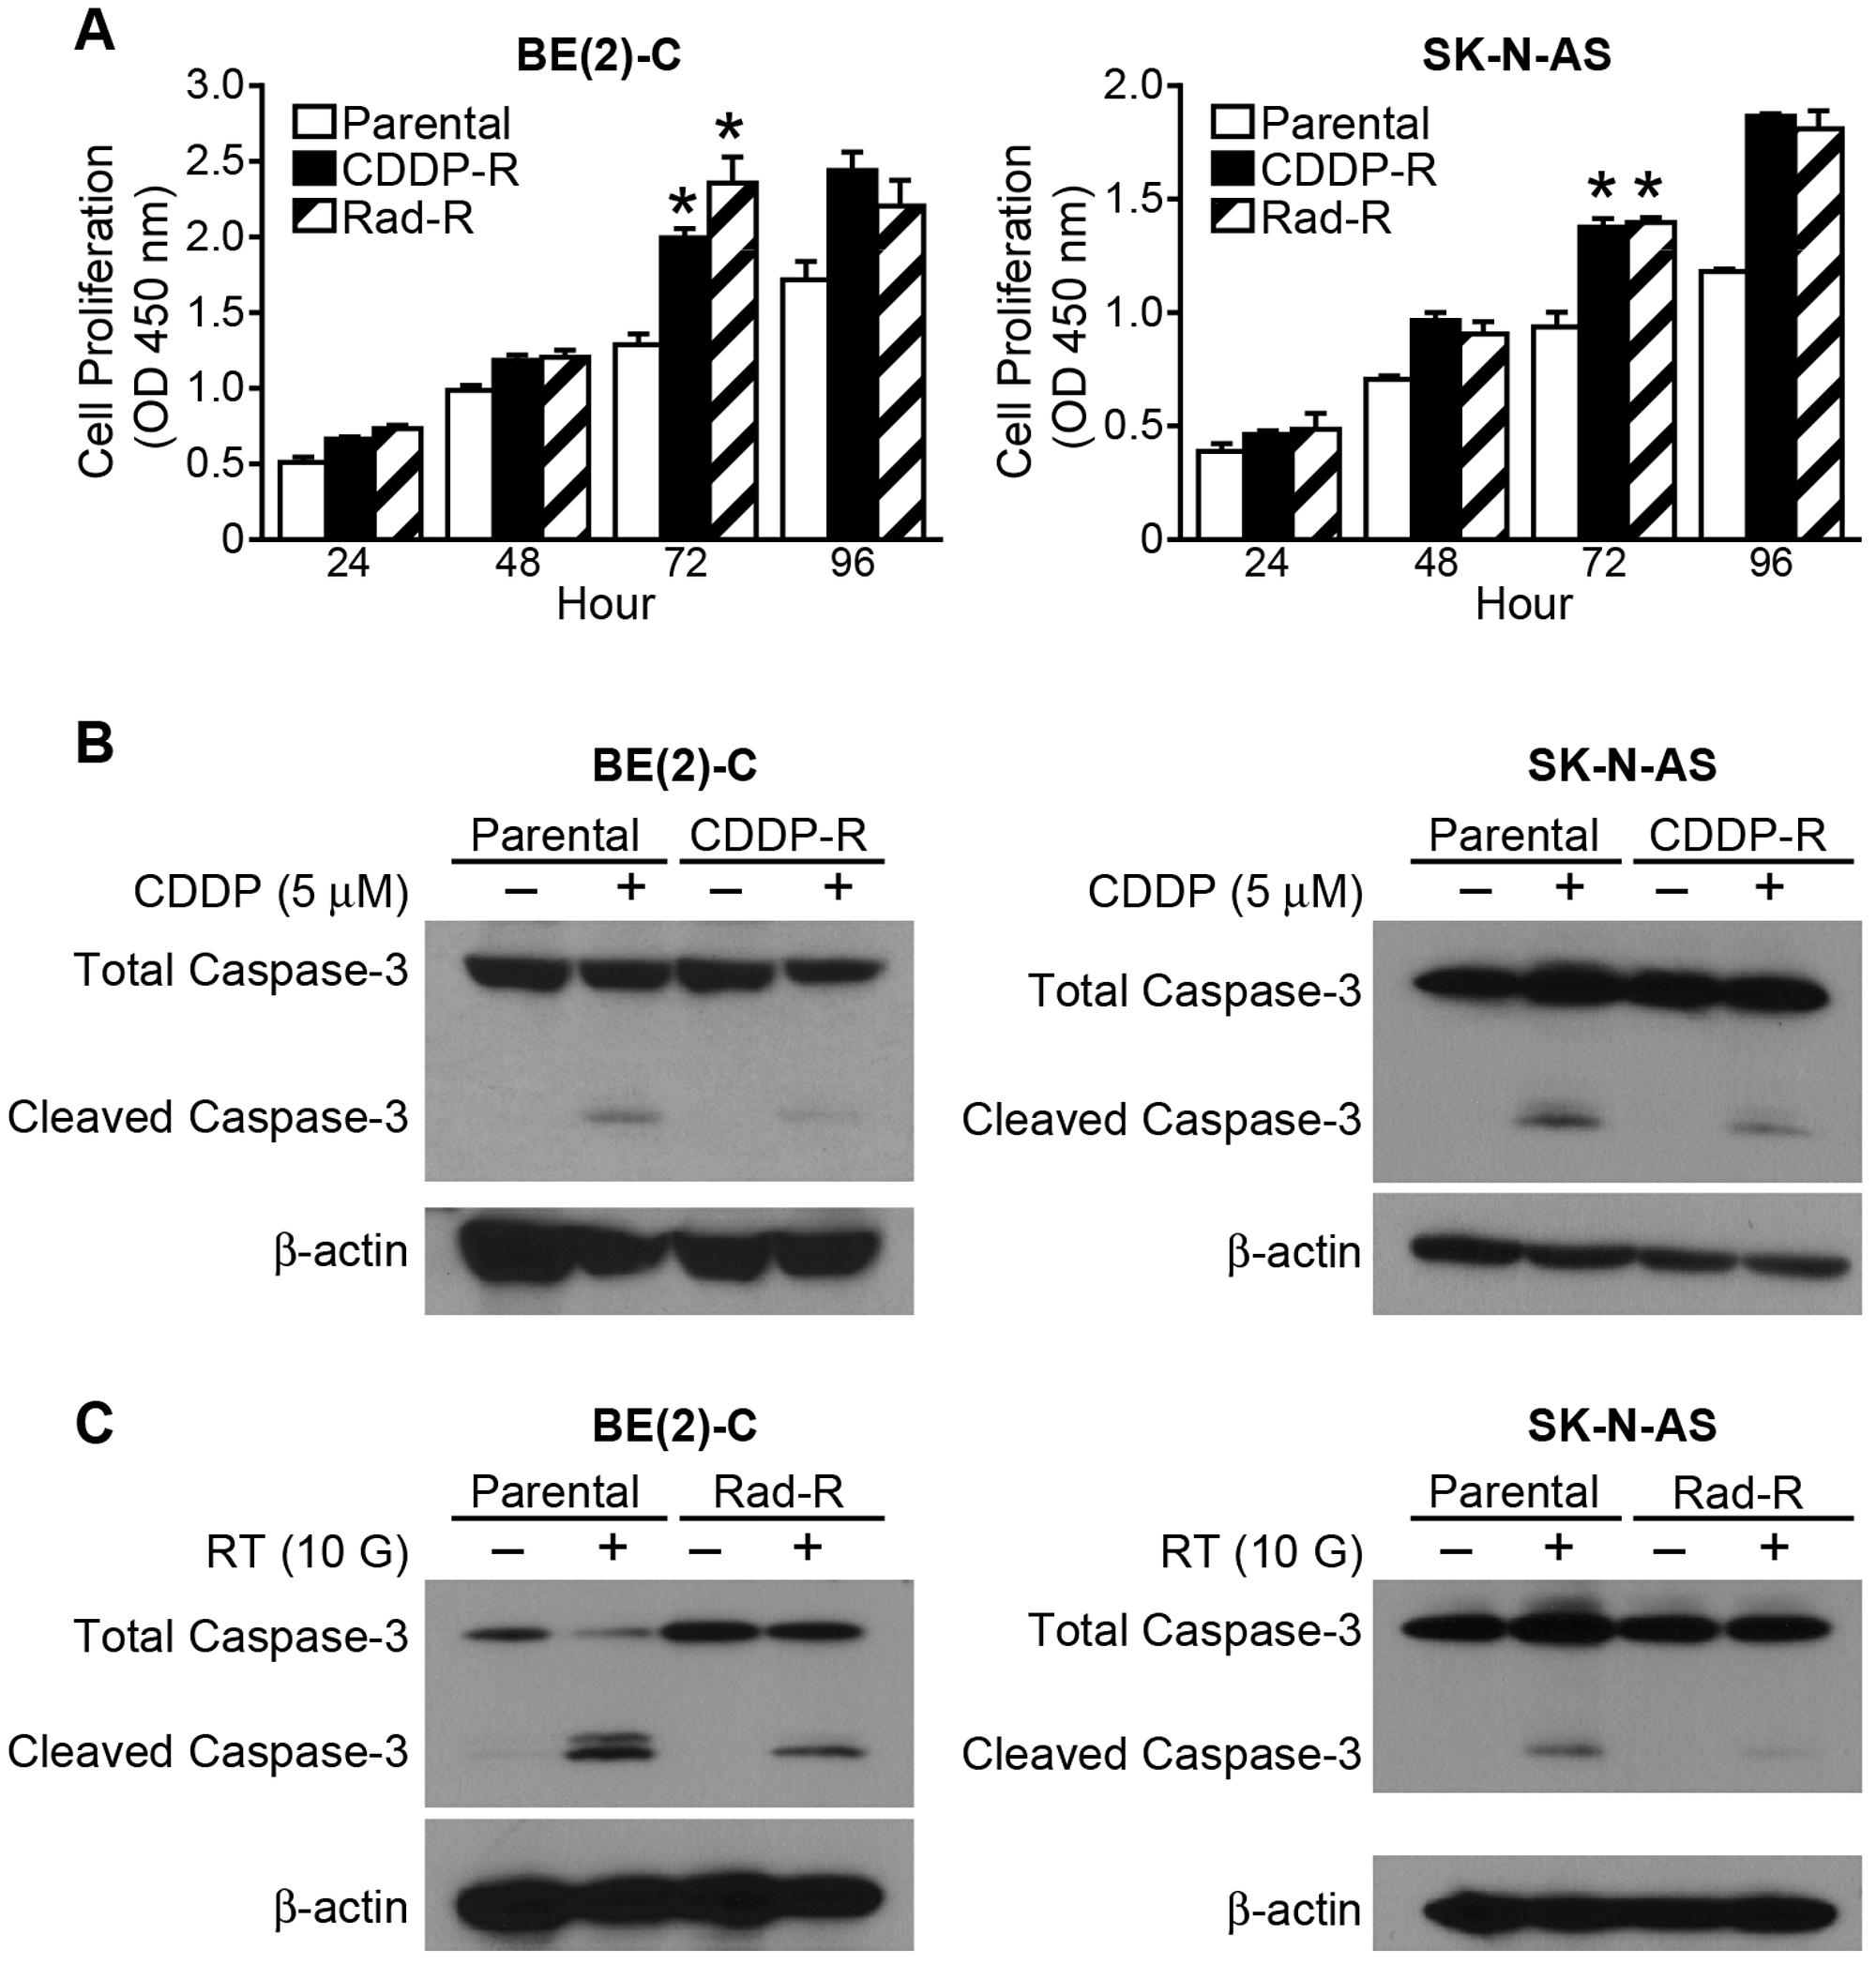 CDDP-R/Rad-R human neuroblastoma cells increase proliferation and inhibit programmed cell death.